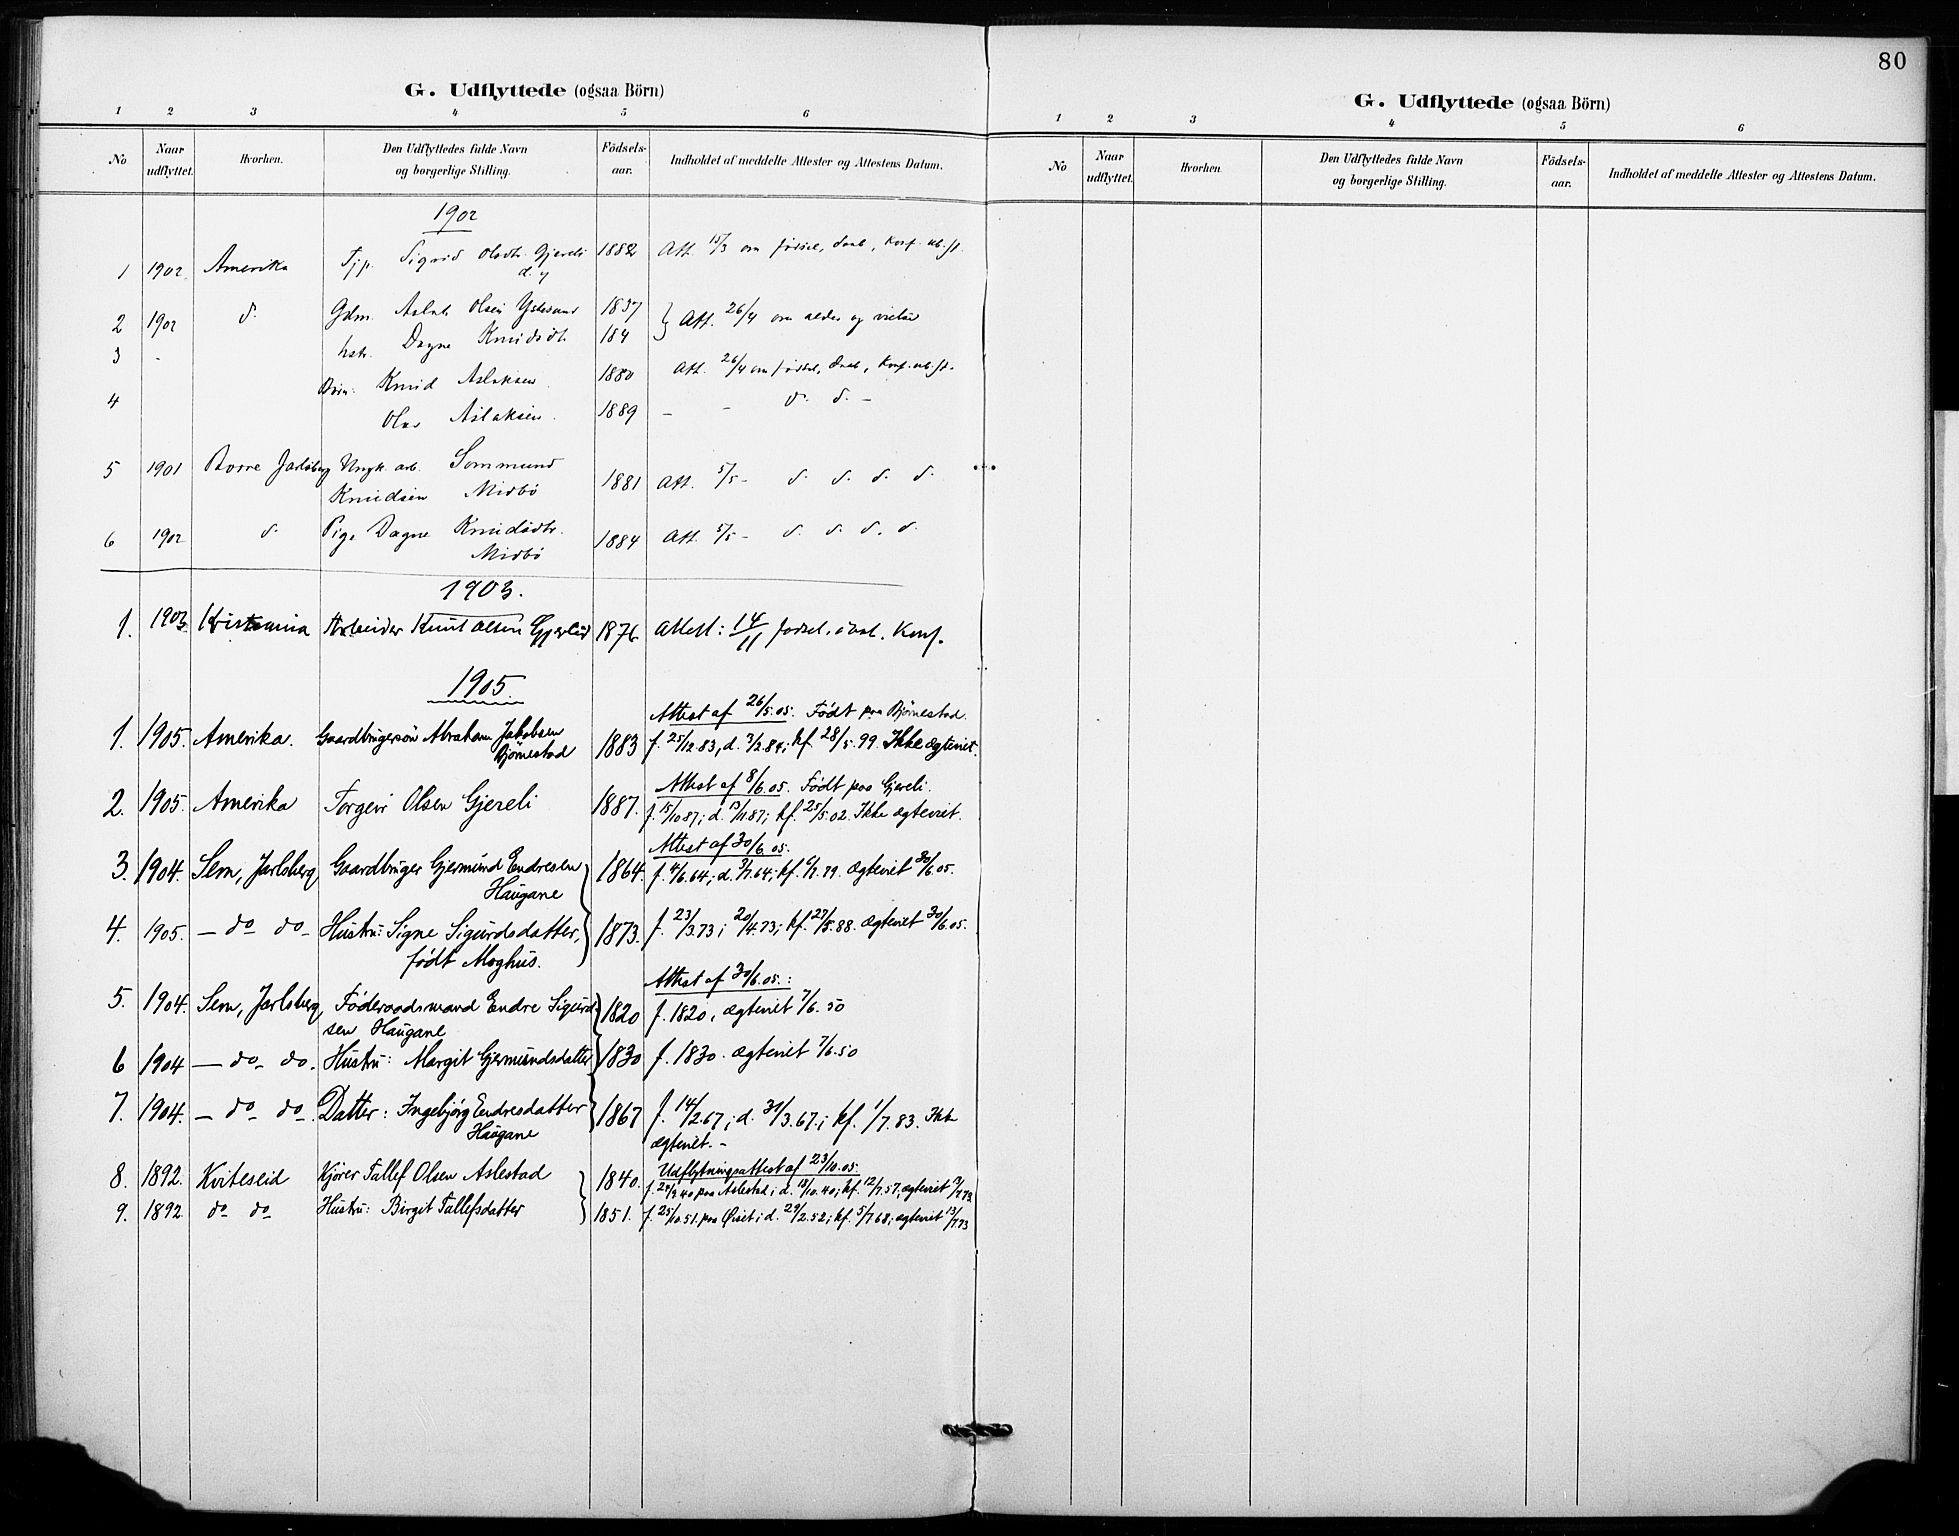 SAKO, Fyresdal kirkebøker, F/Fb/L0003: Ministerialbok nr. II 3, 1887-1903, s. 80